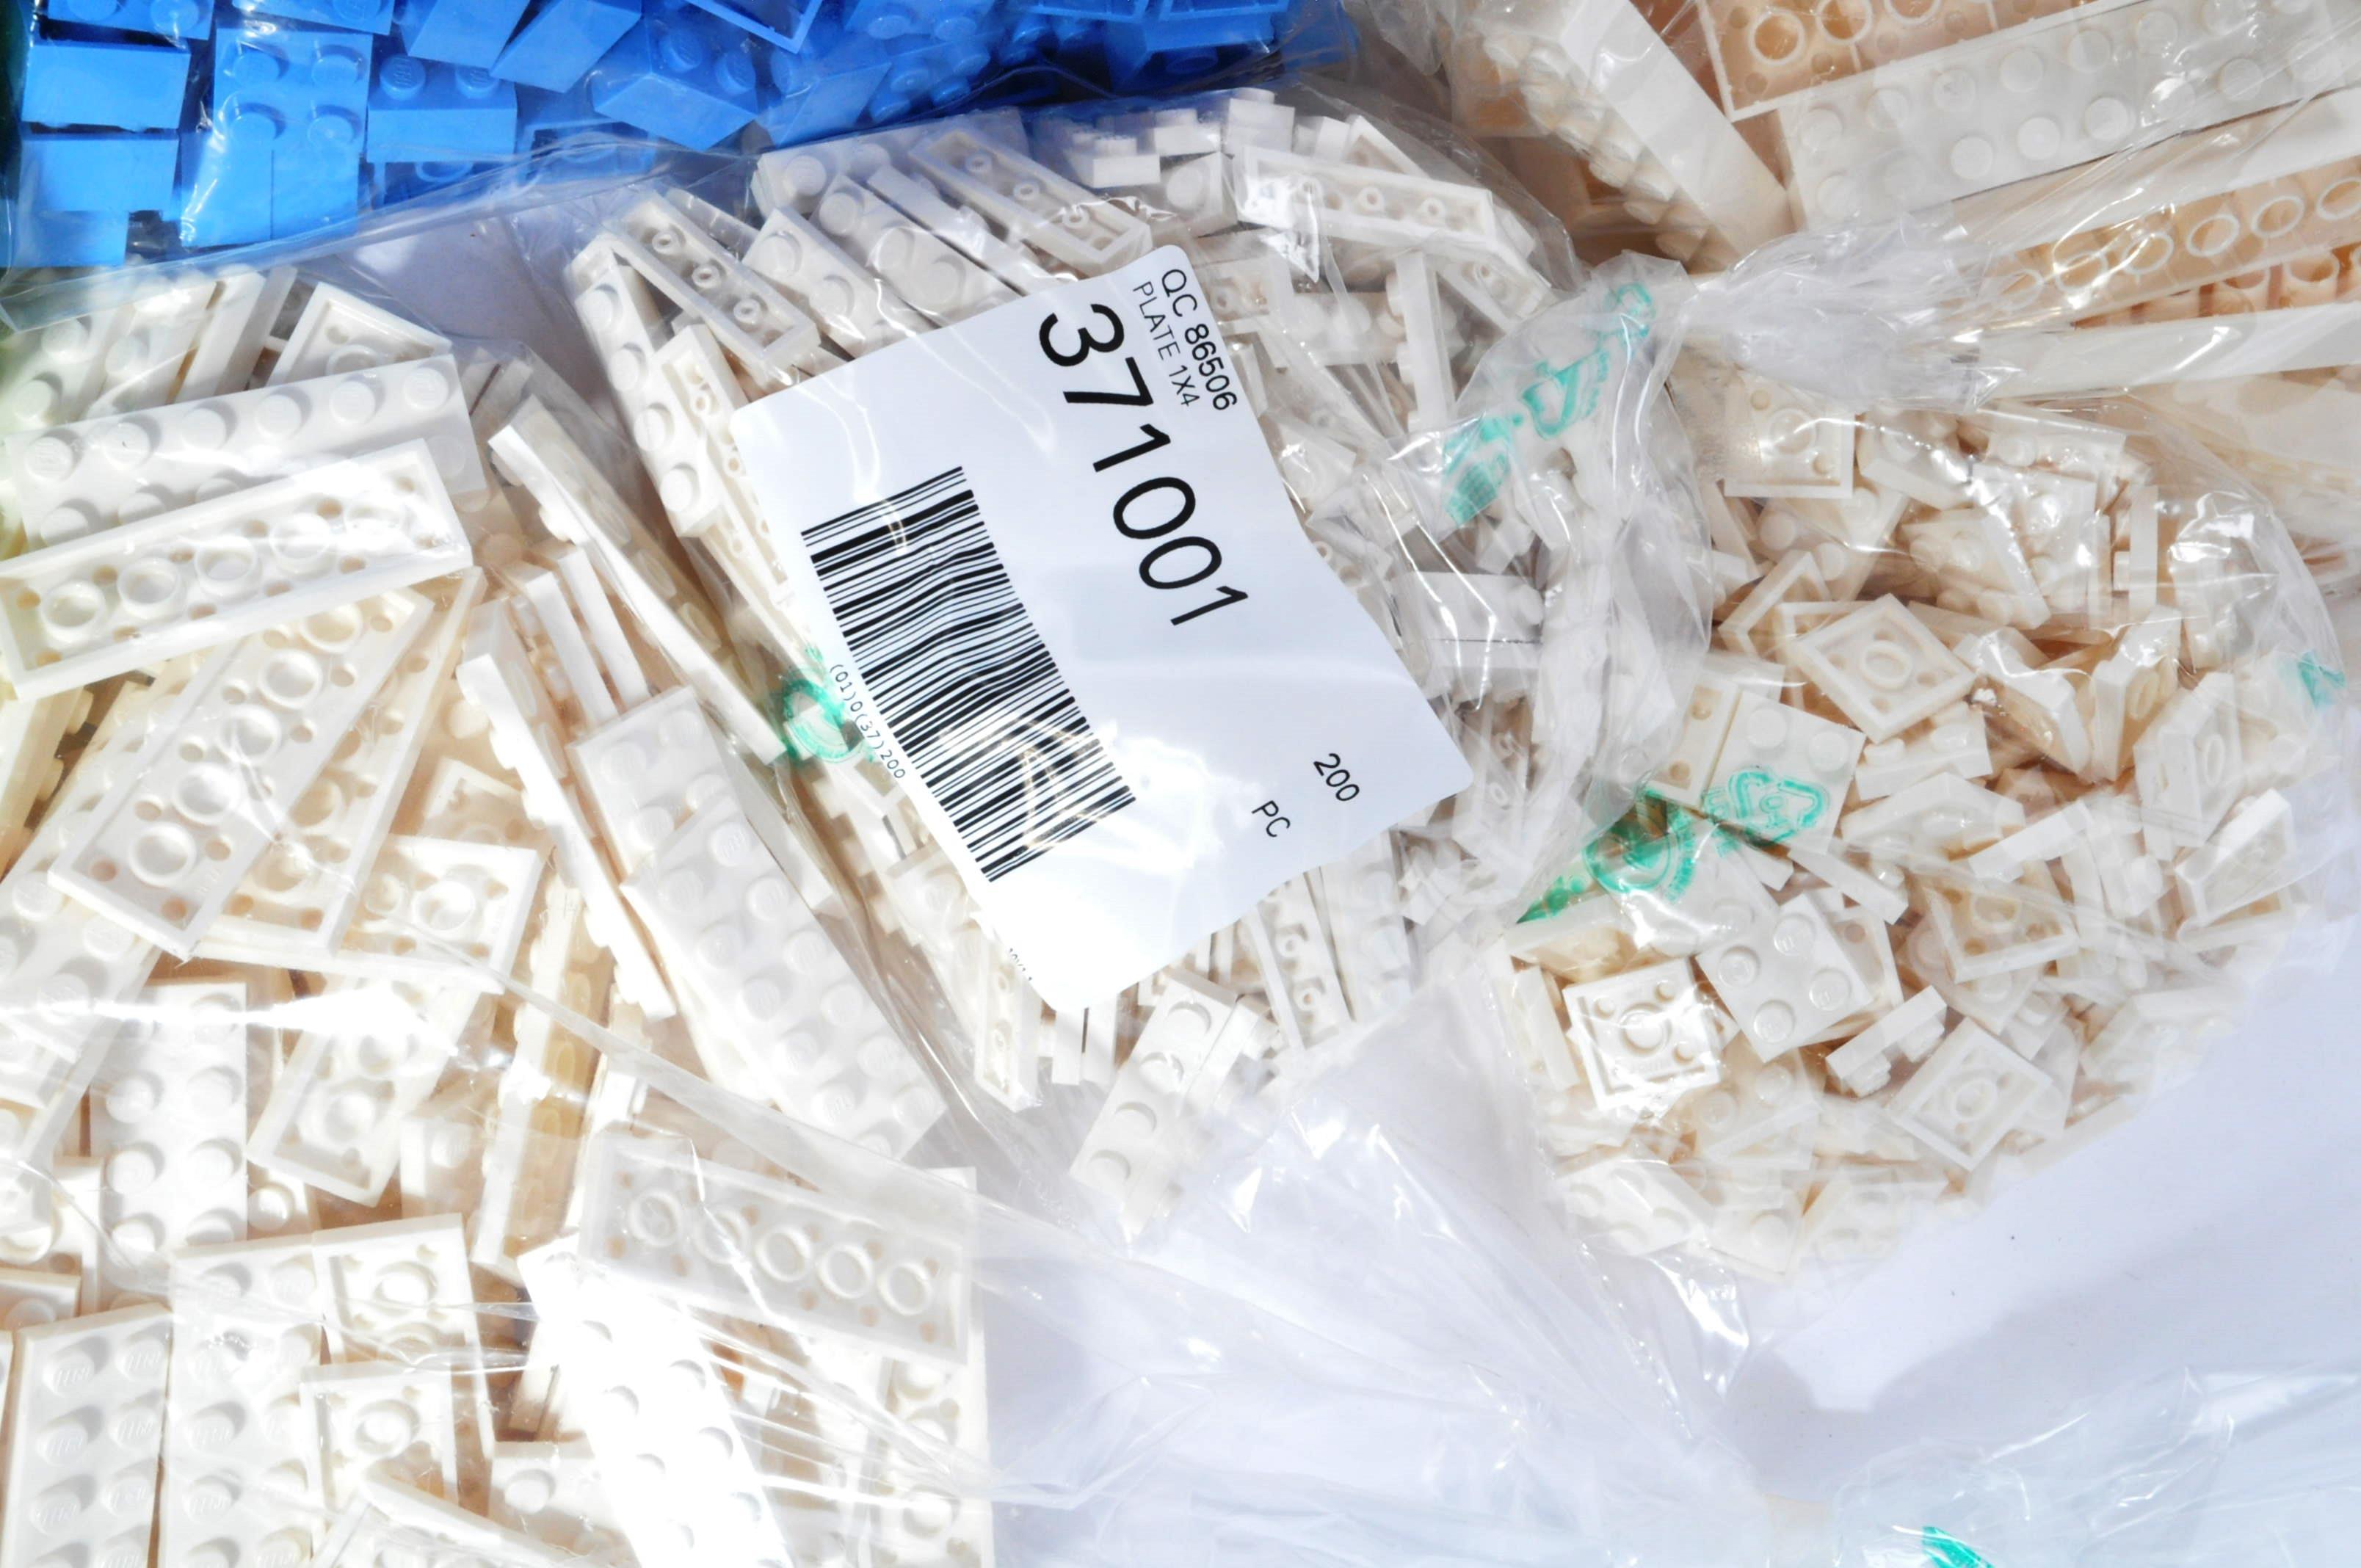 LEGO - 10KG OF BRAND NEW UNUSED LEGO BUILDING BRICKS - Image 6 of 7